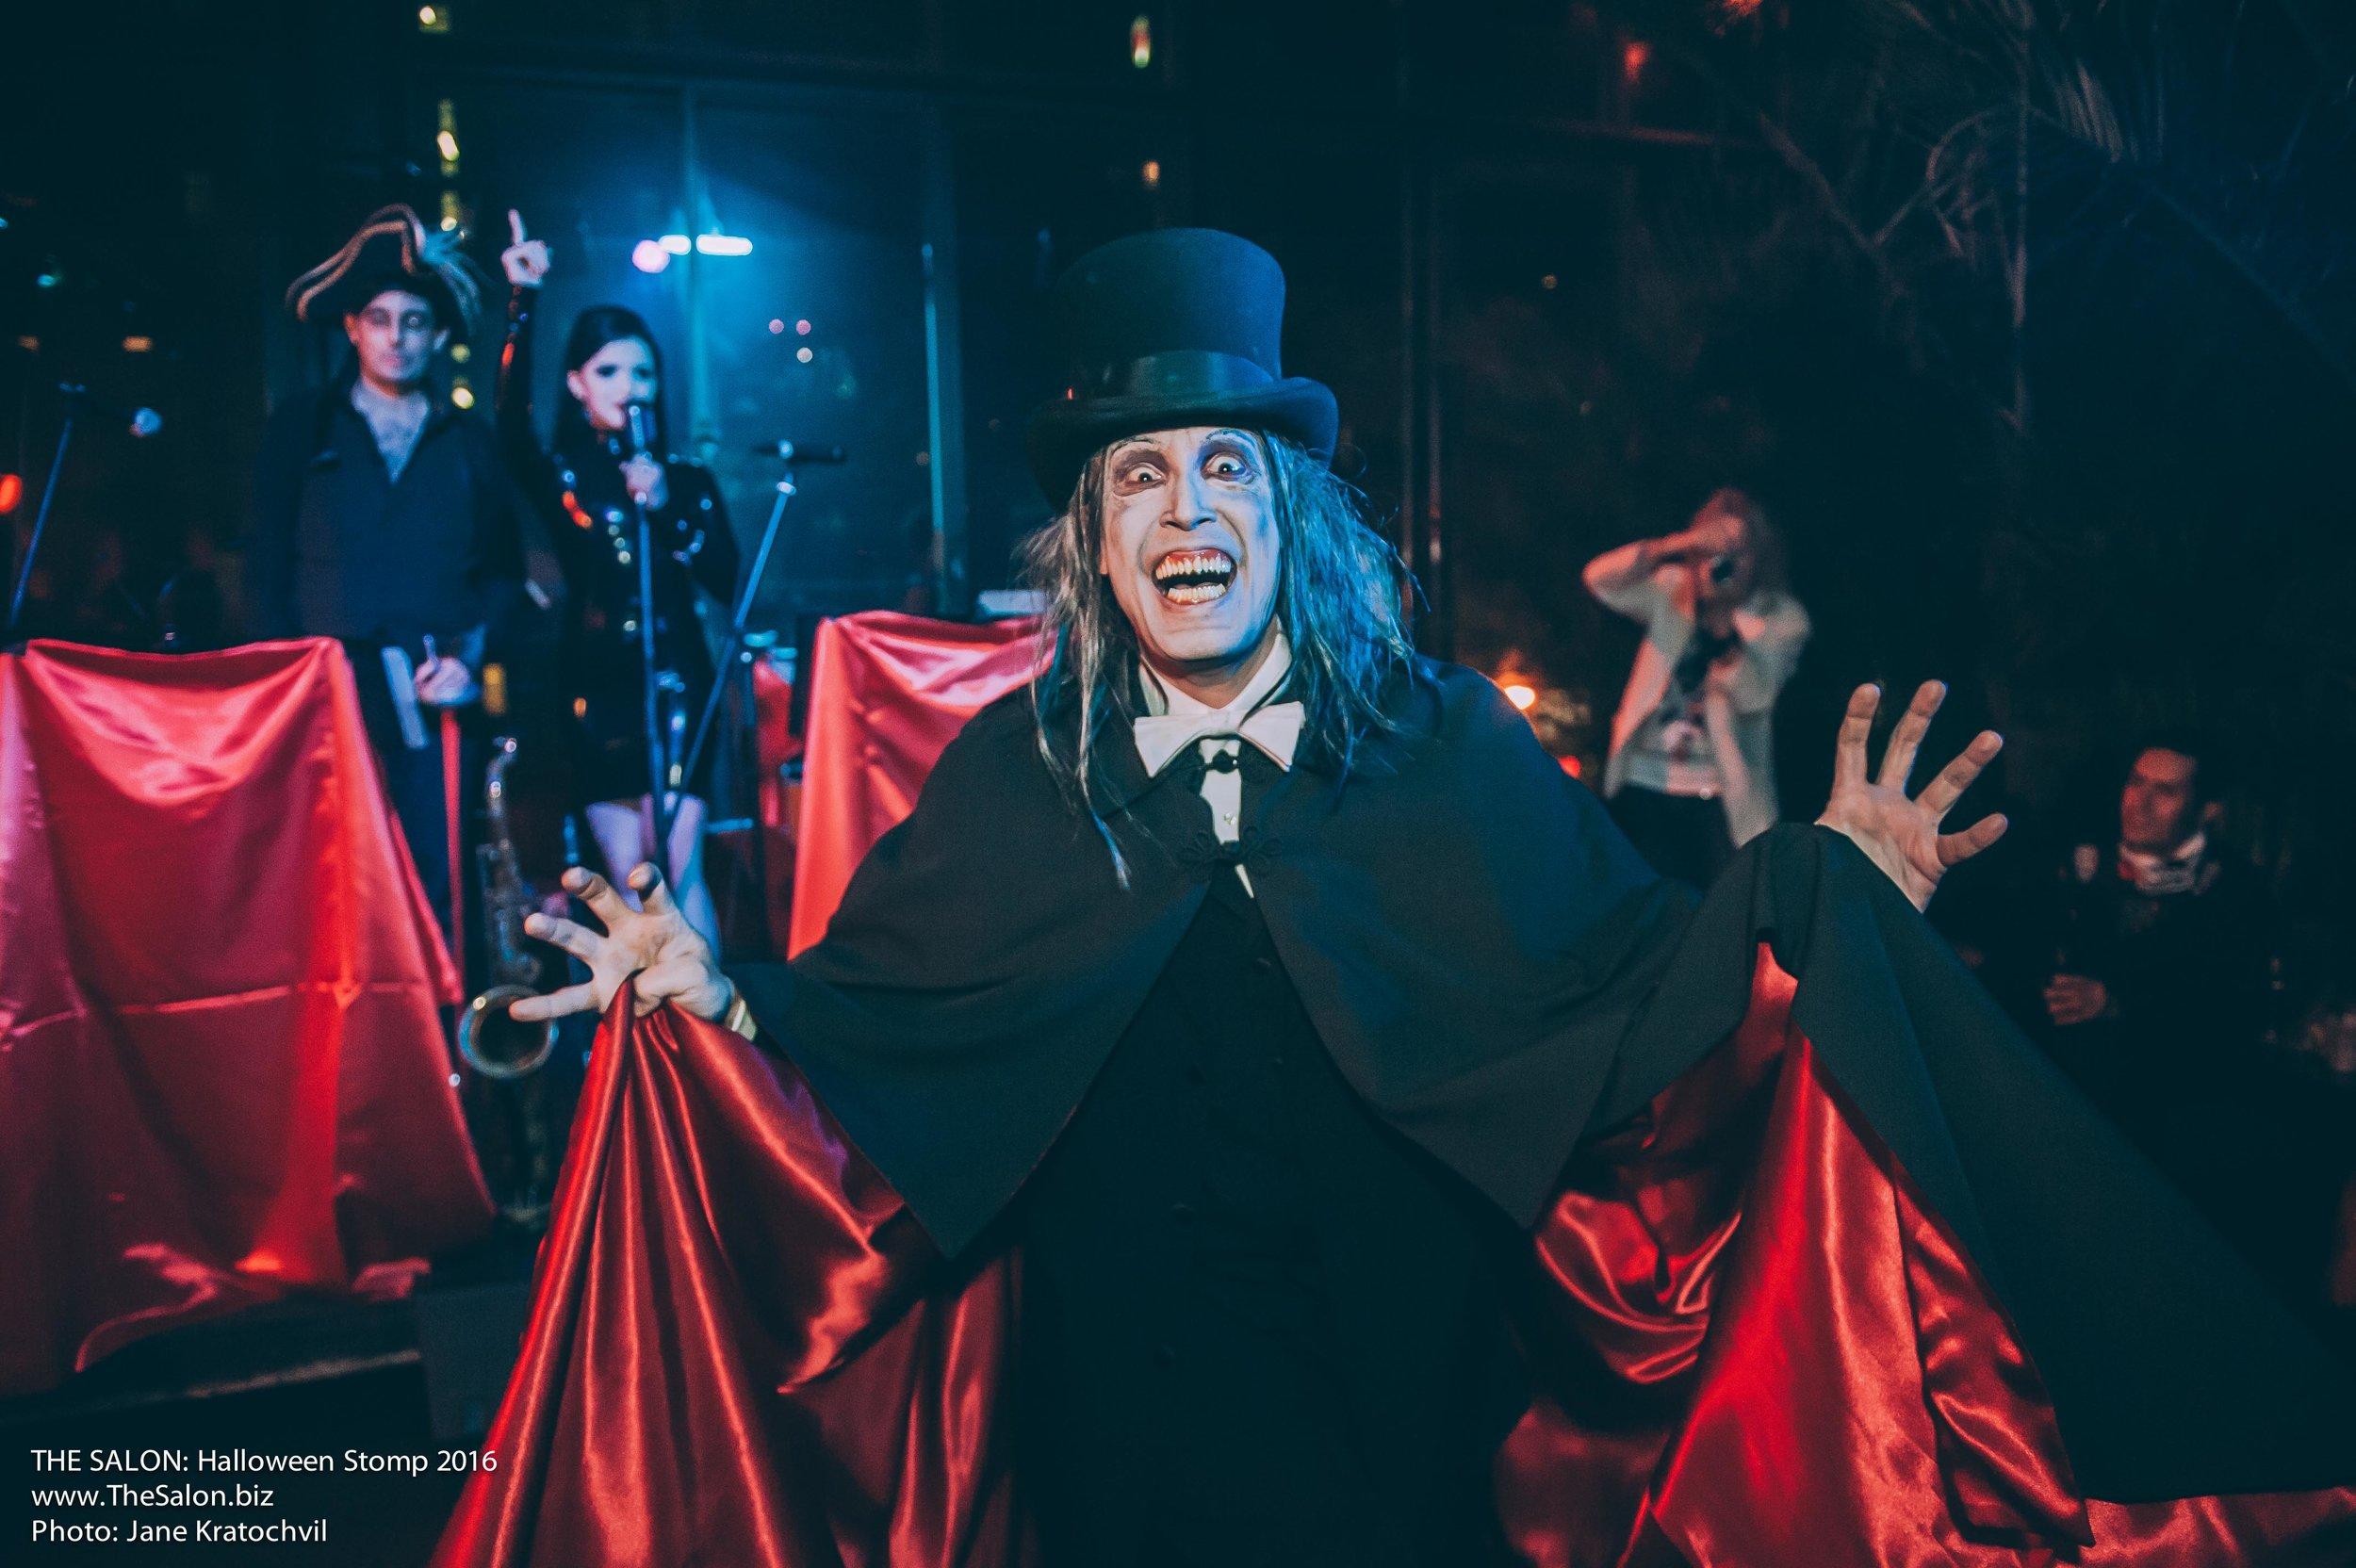 THE-SALON_HalloweenStomp16__photocredit-jane-kratochvil__0848.jpg